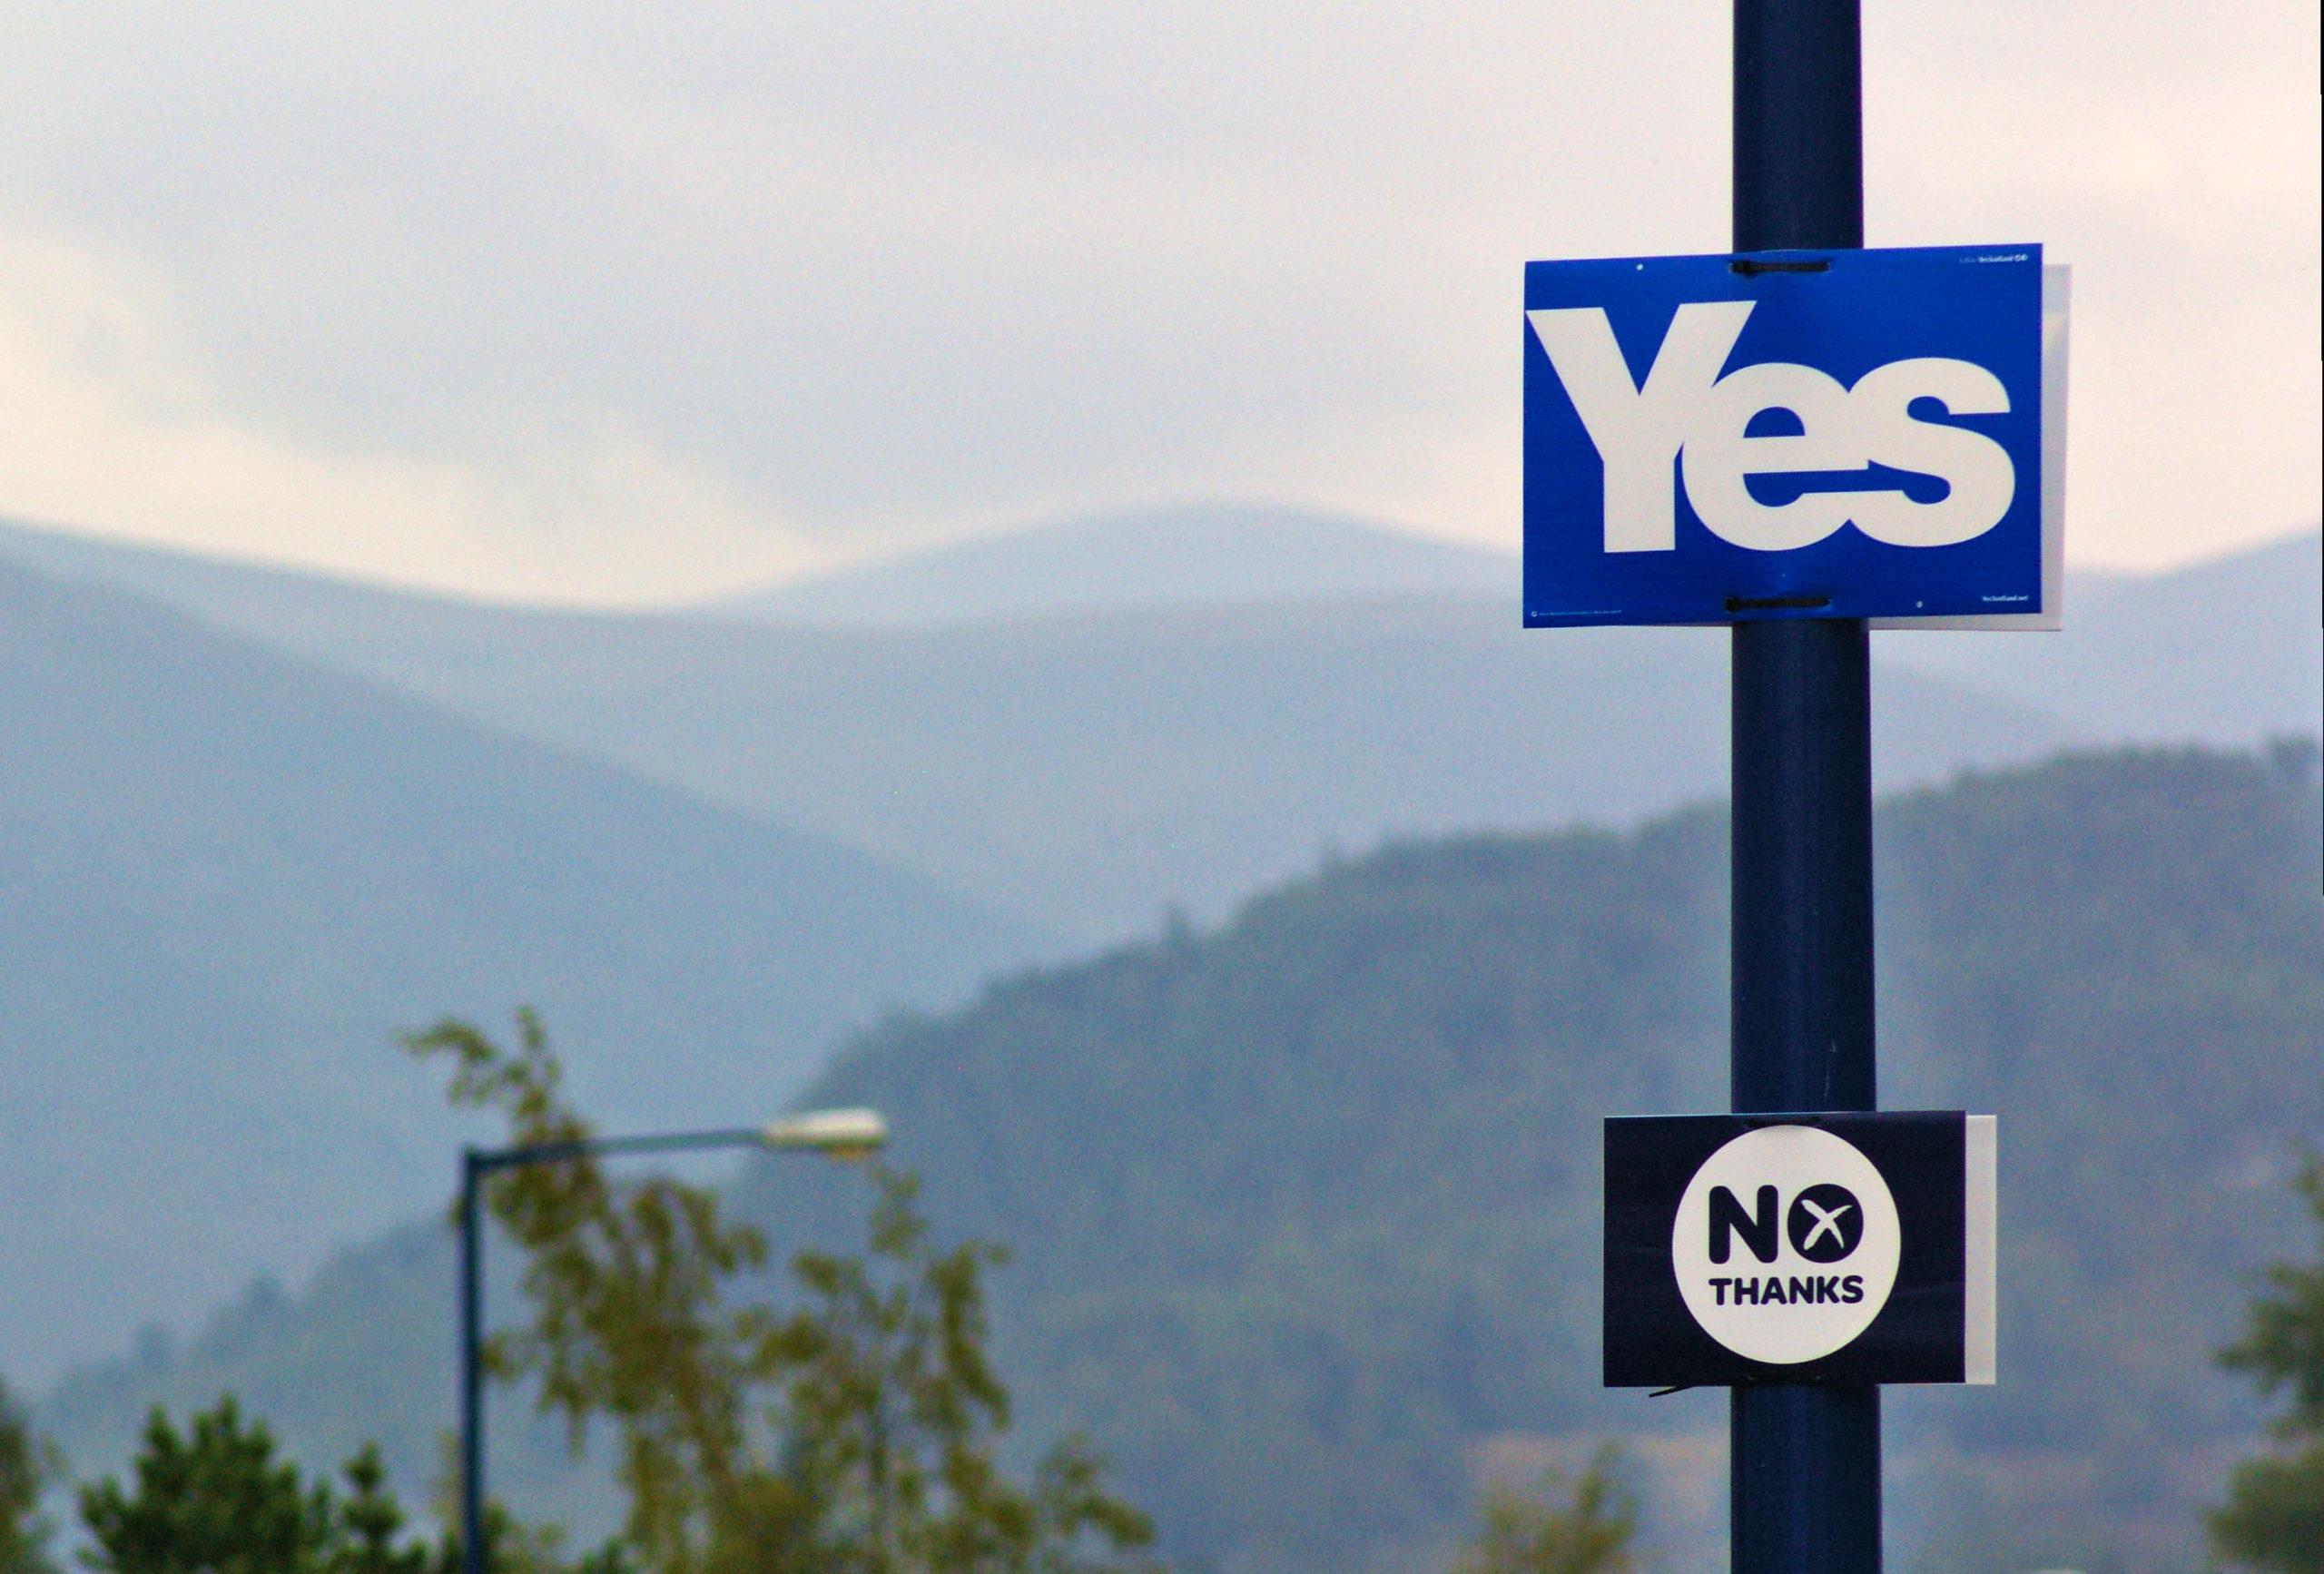 scotland independence borders nationalism brexit united kingdom separatism